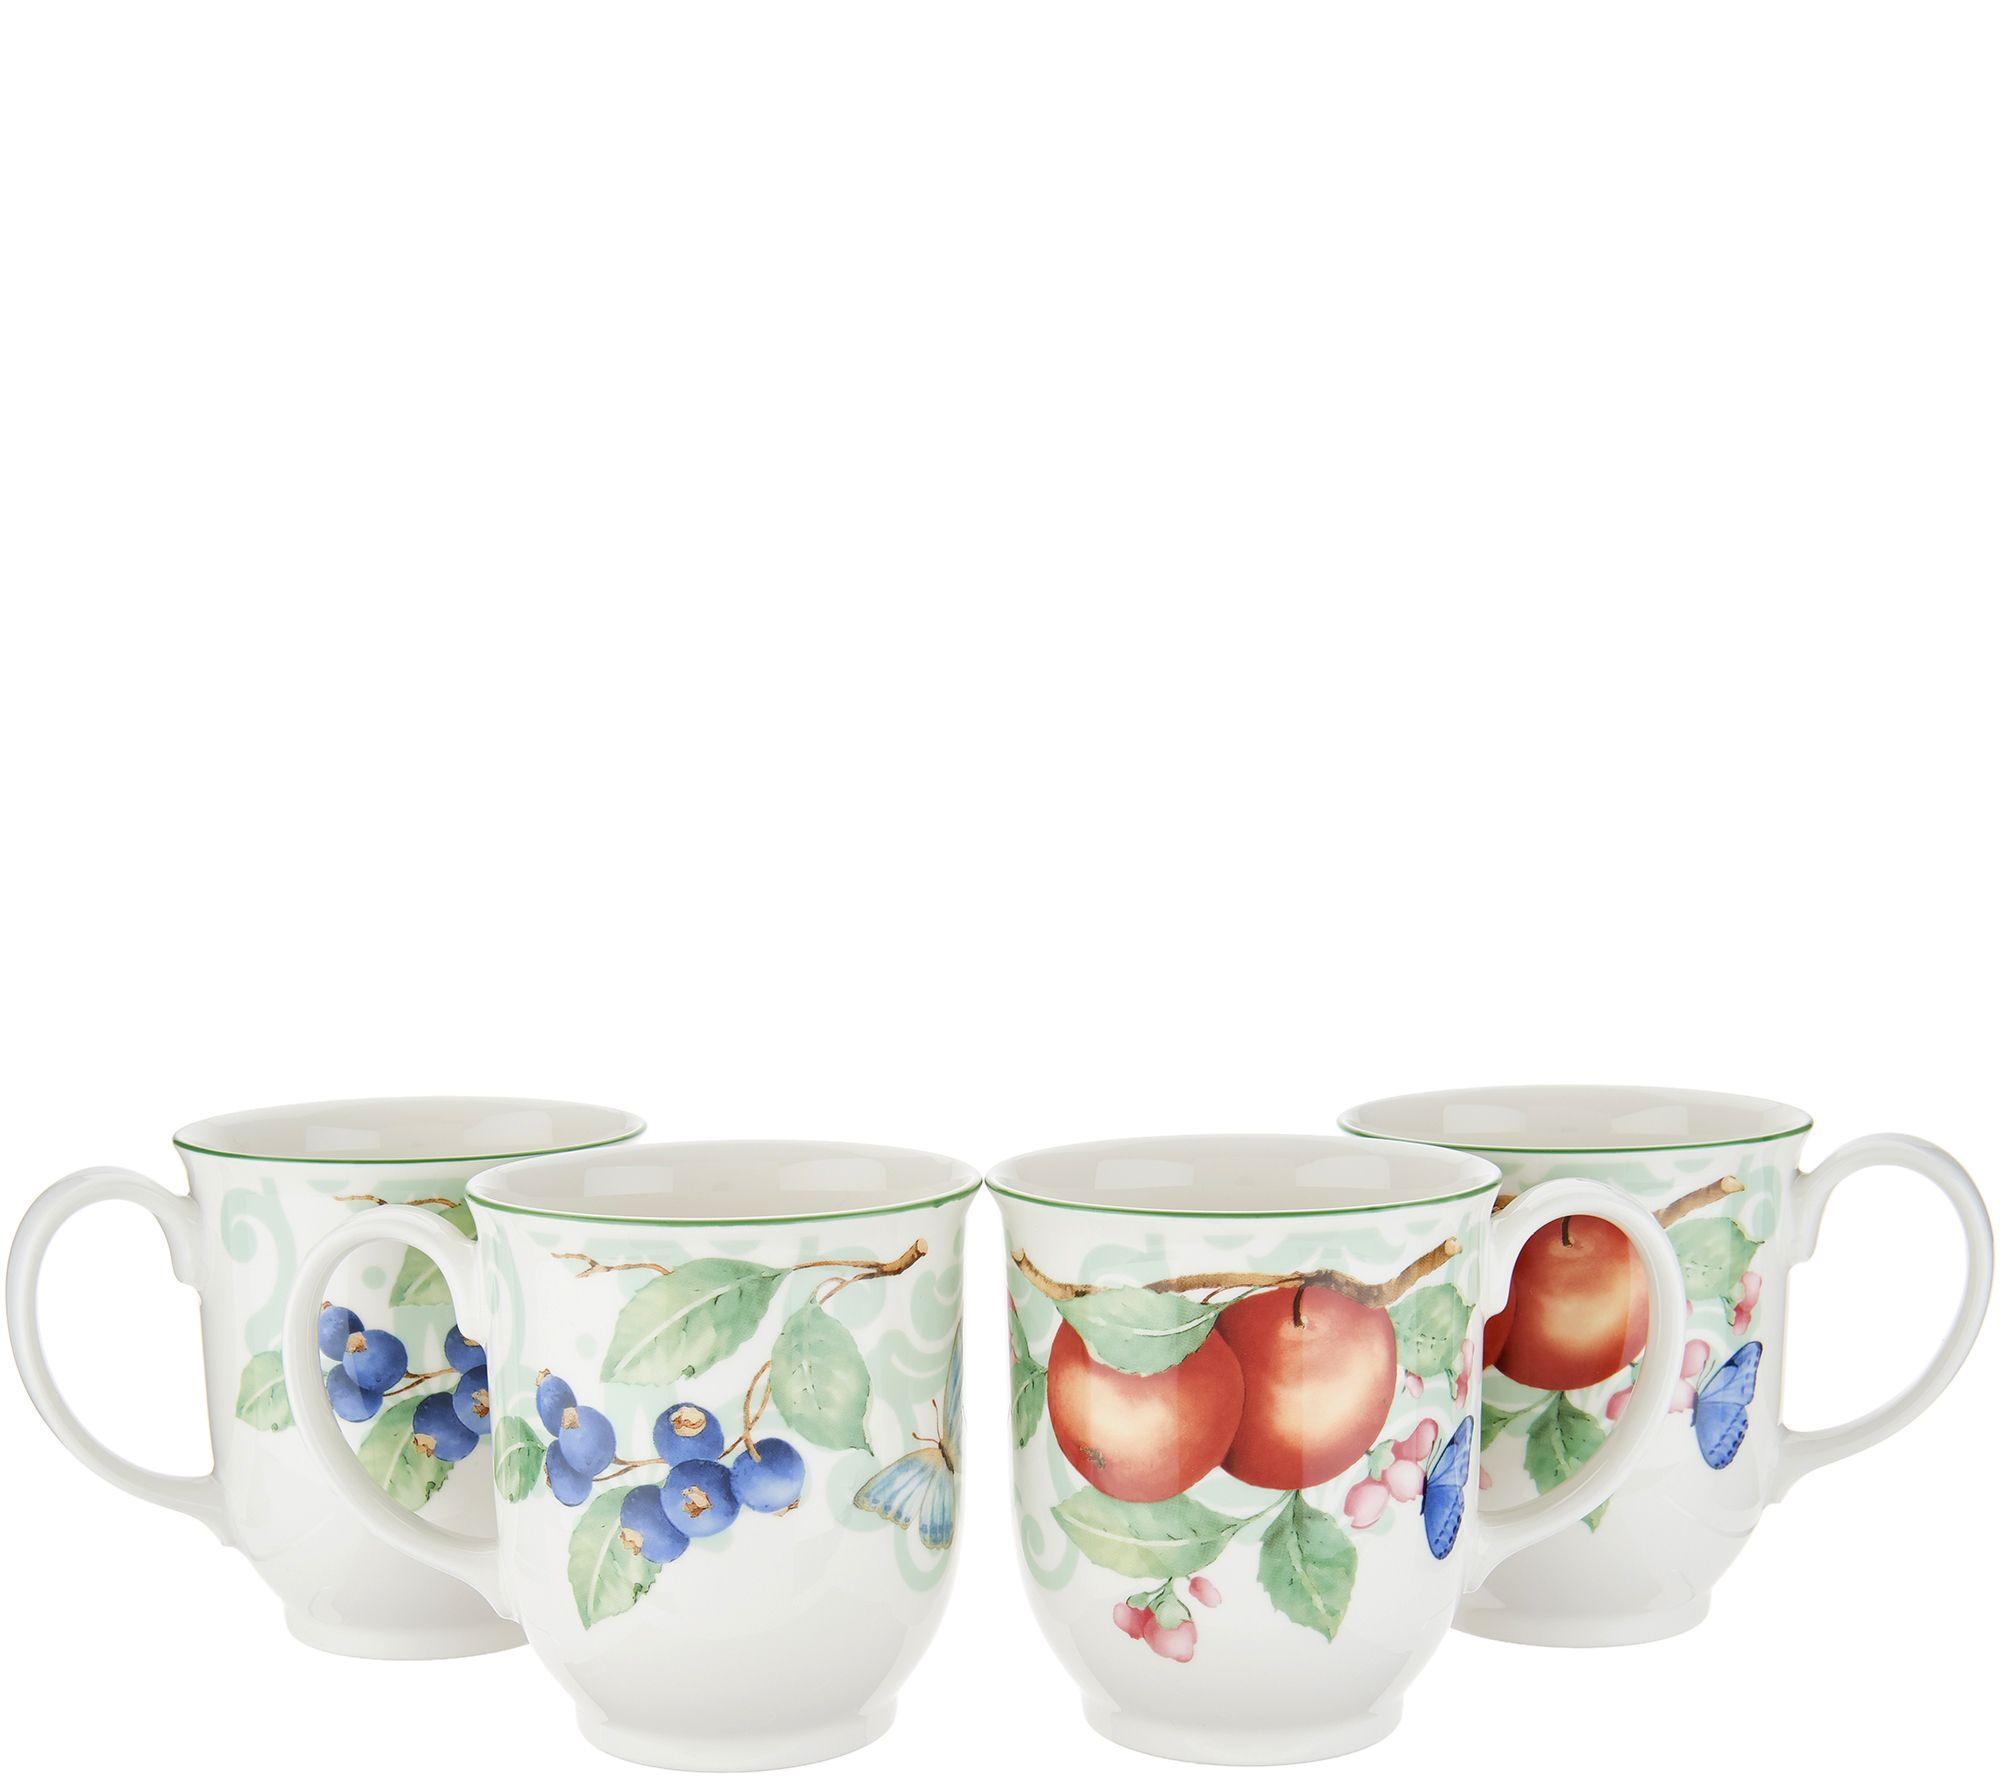 Villeroy Boch French Garden Set of 4 Porcelain 14oz Mugs Page 1